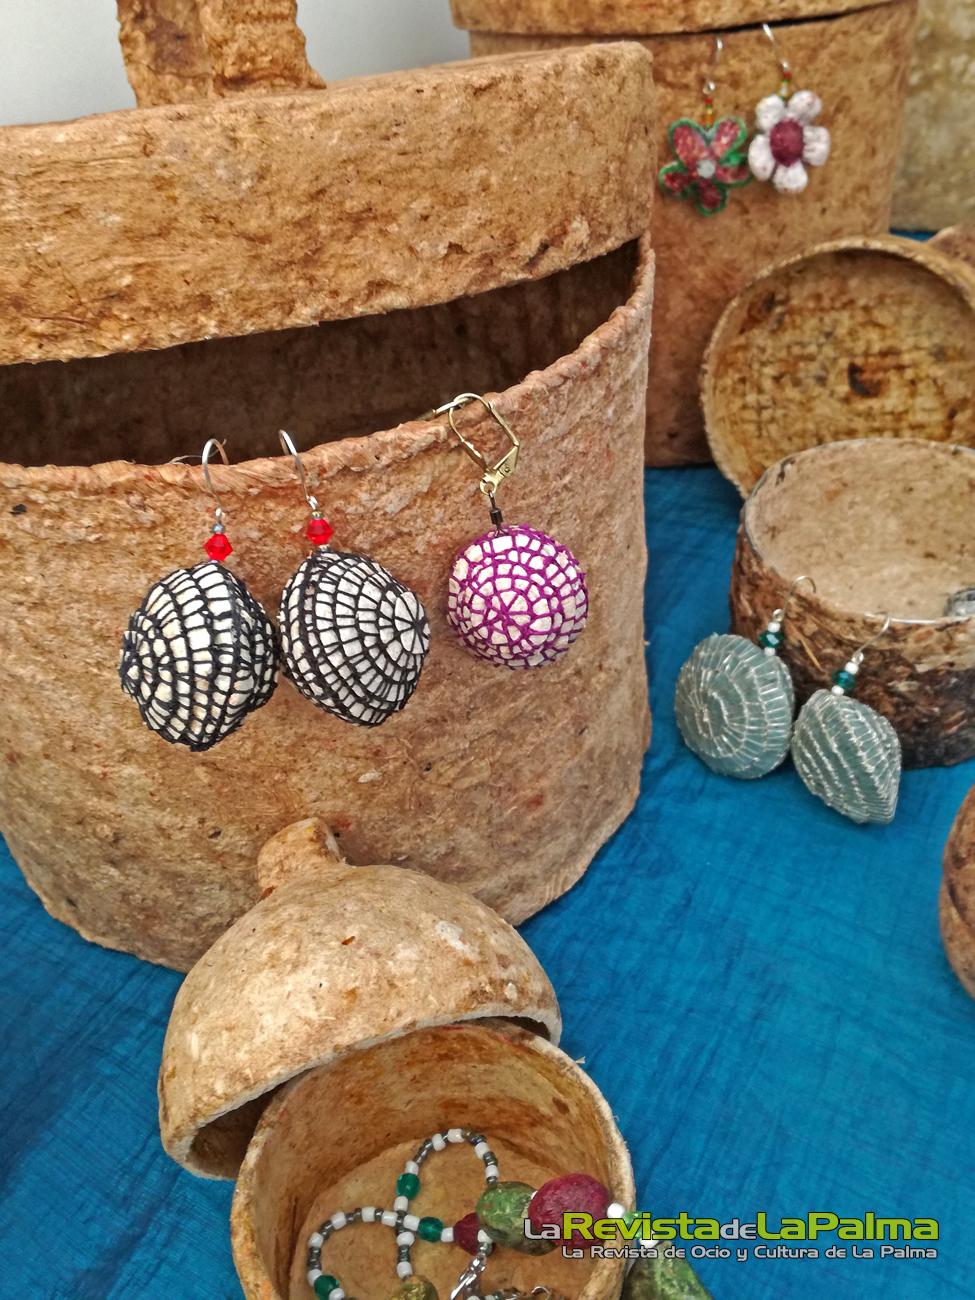 Feria Insular Artesania Puntallana Cajas artesanales de fibras naturales